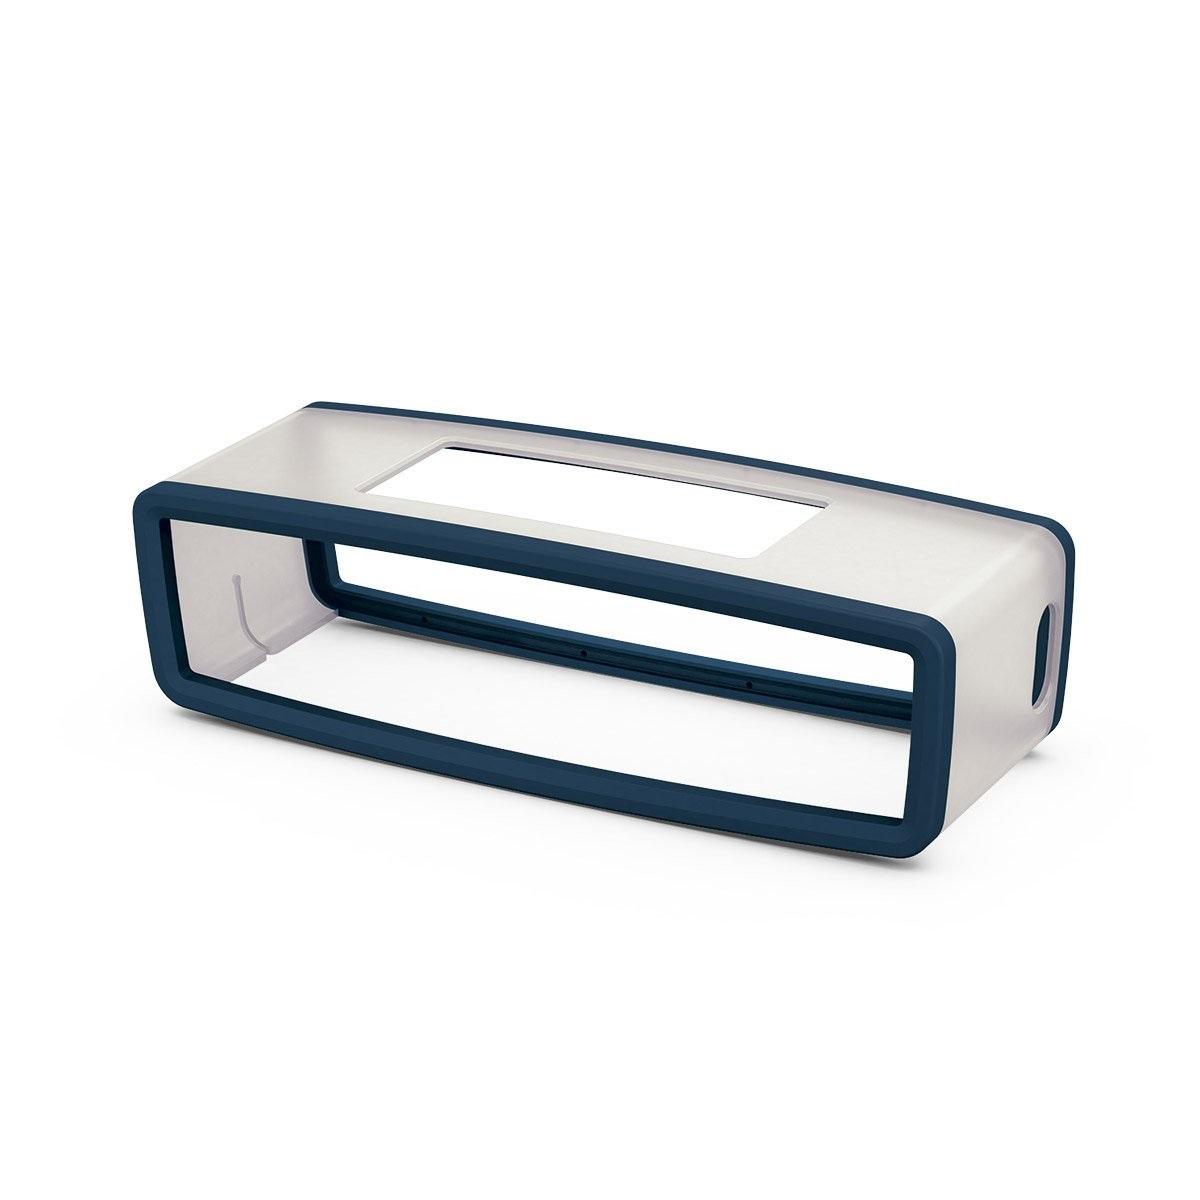 Bose SoundLink Mini Soft Cover NAVY BLUE